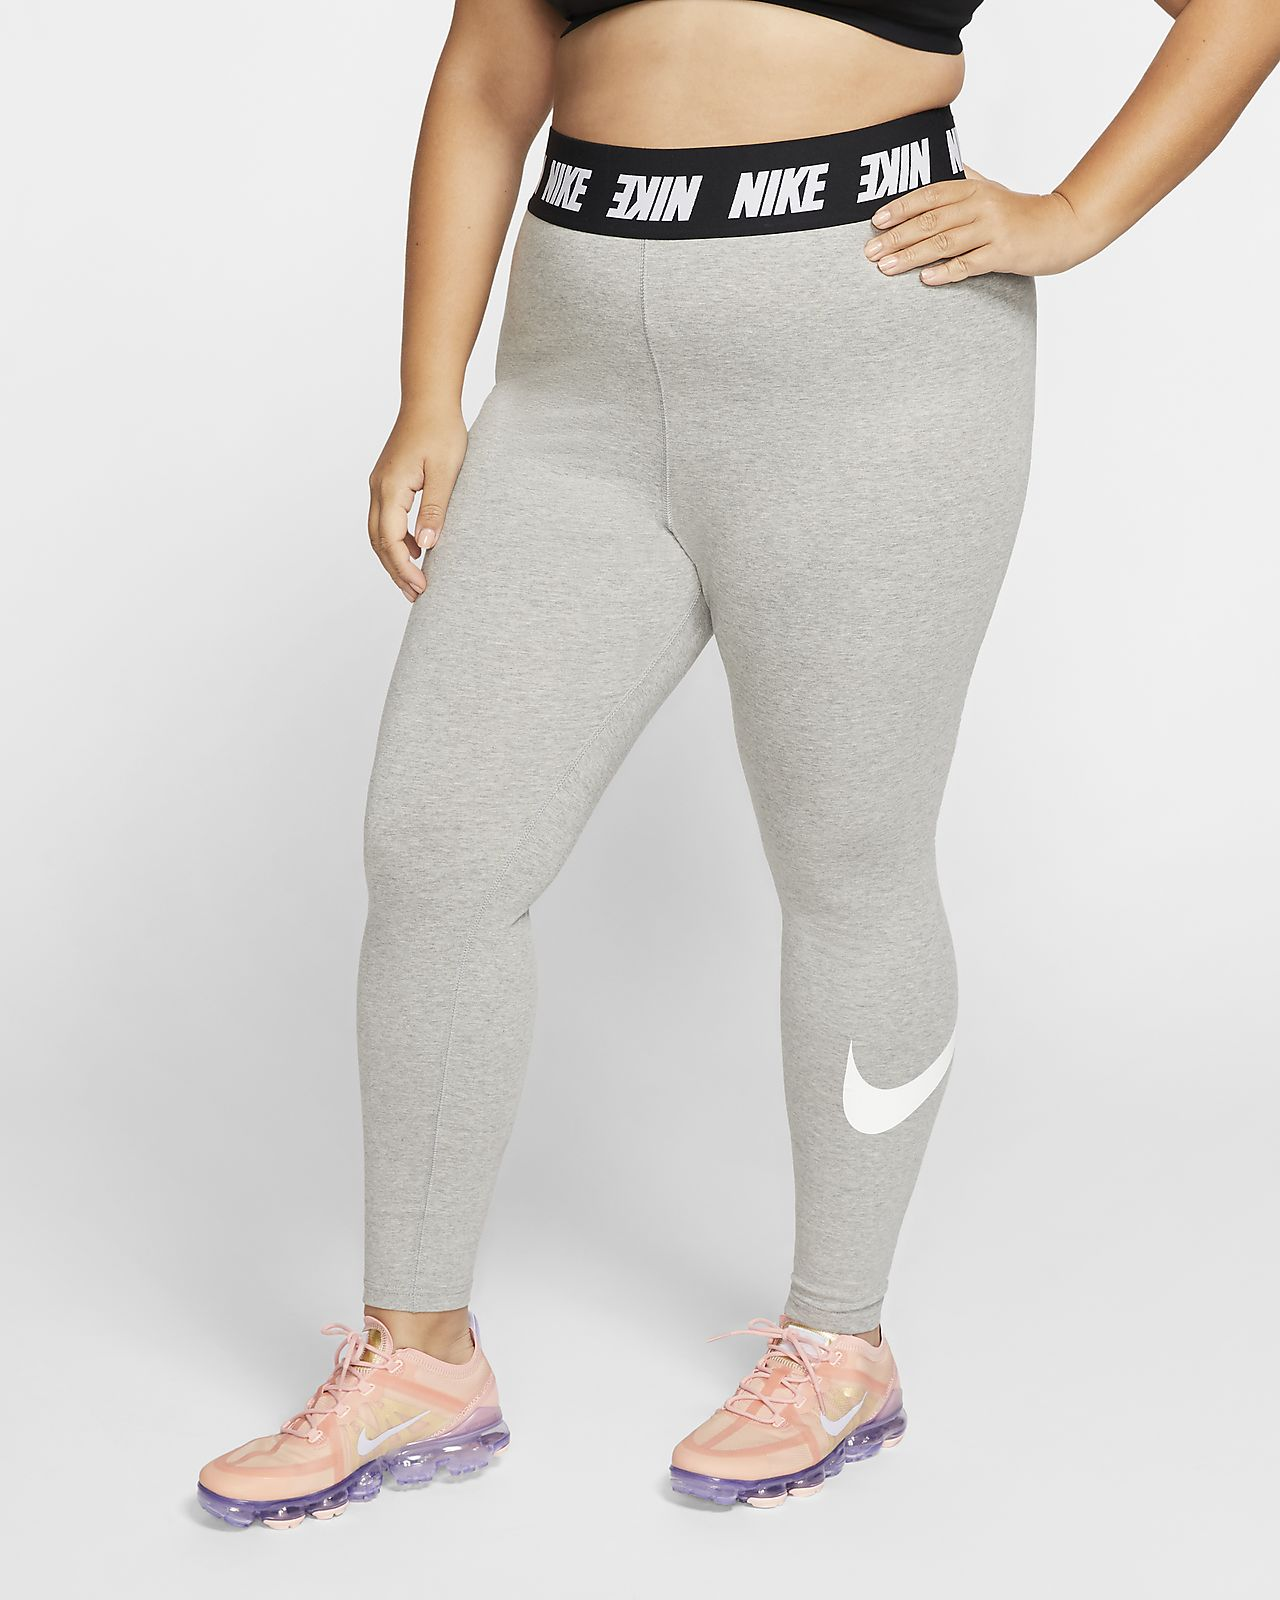 Женские леггинсы Nike Sportswear (большие размеры)